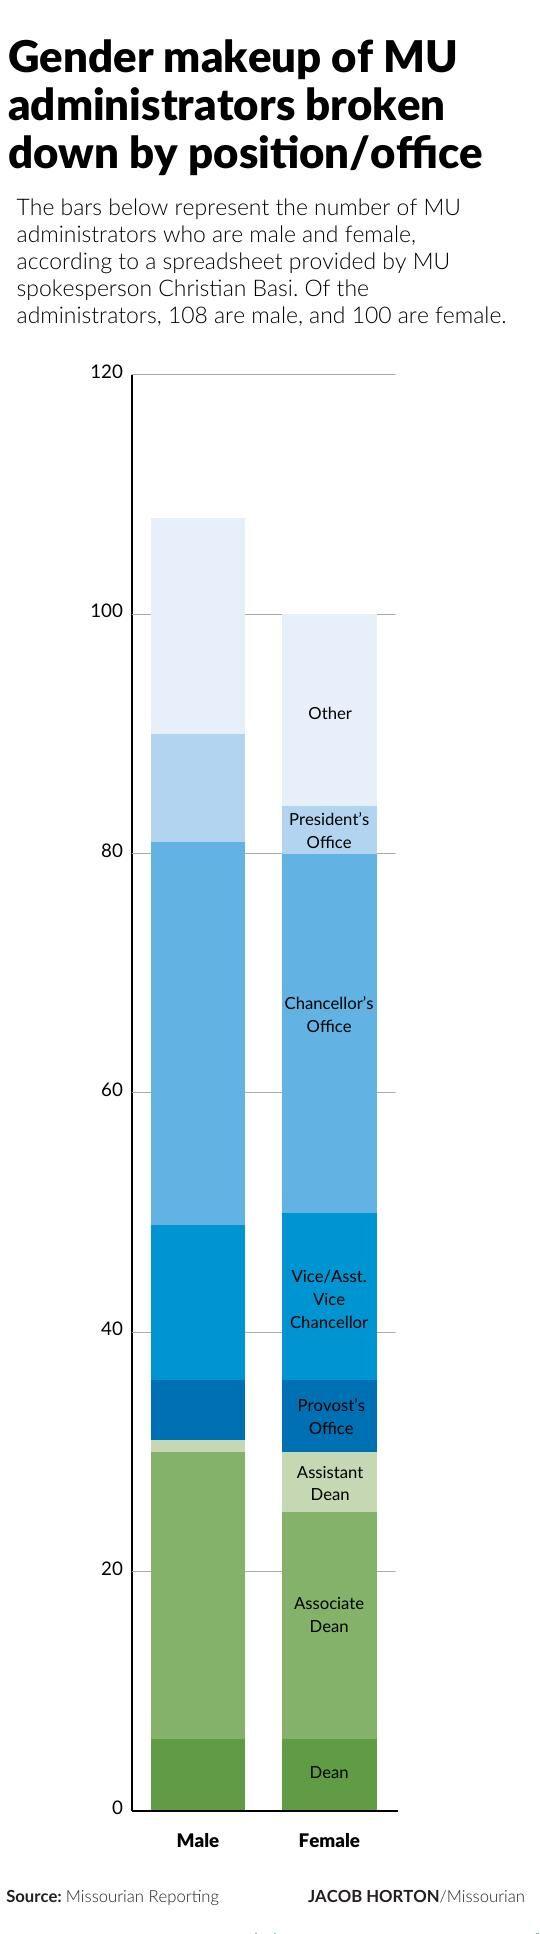 Gender makeup of MU administrators broken down by position/office